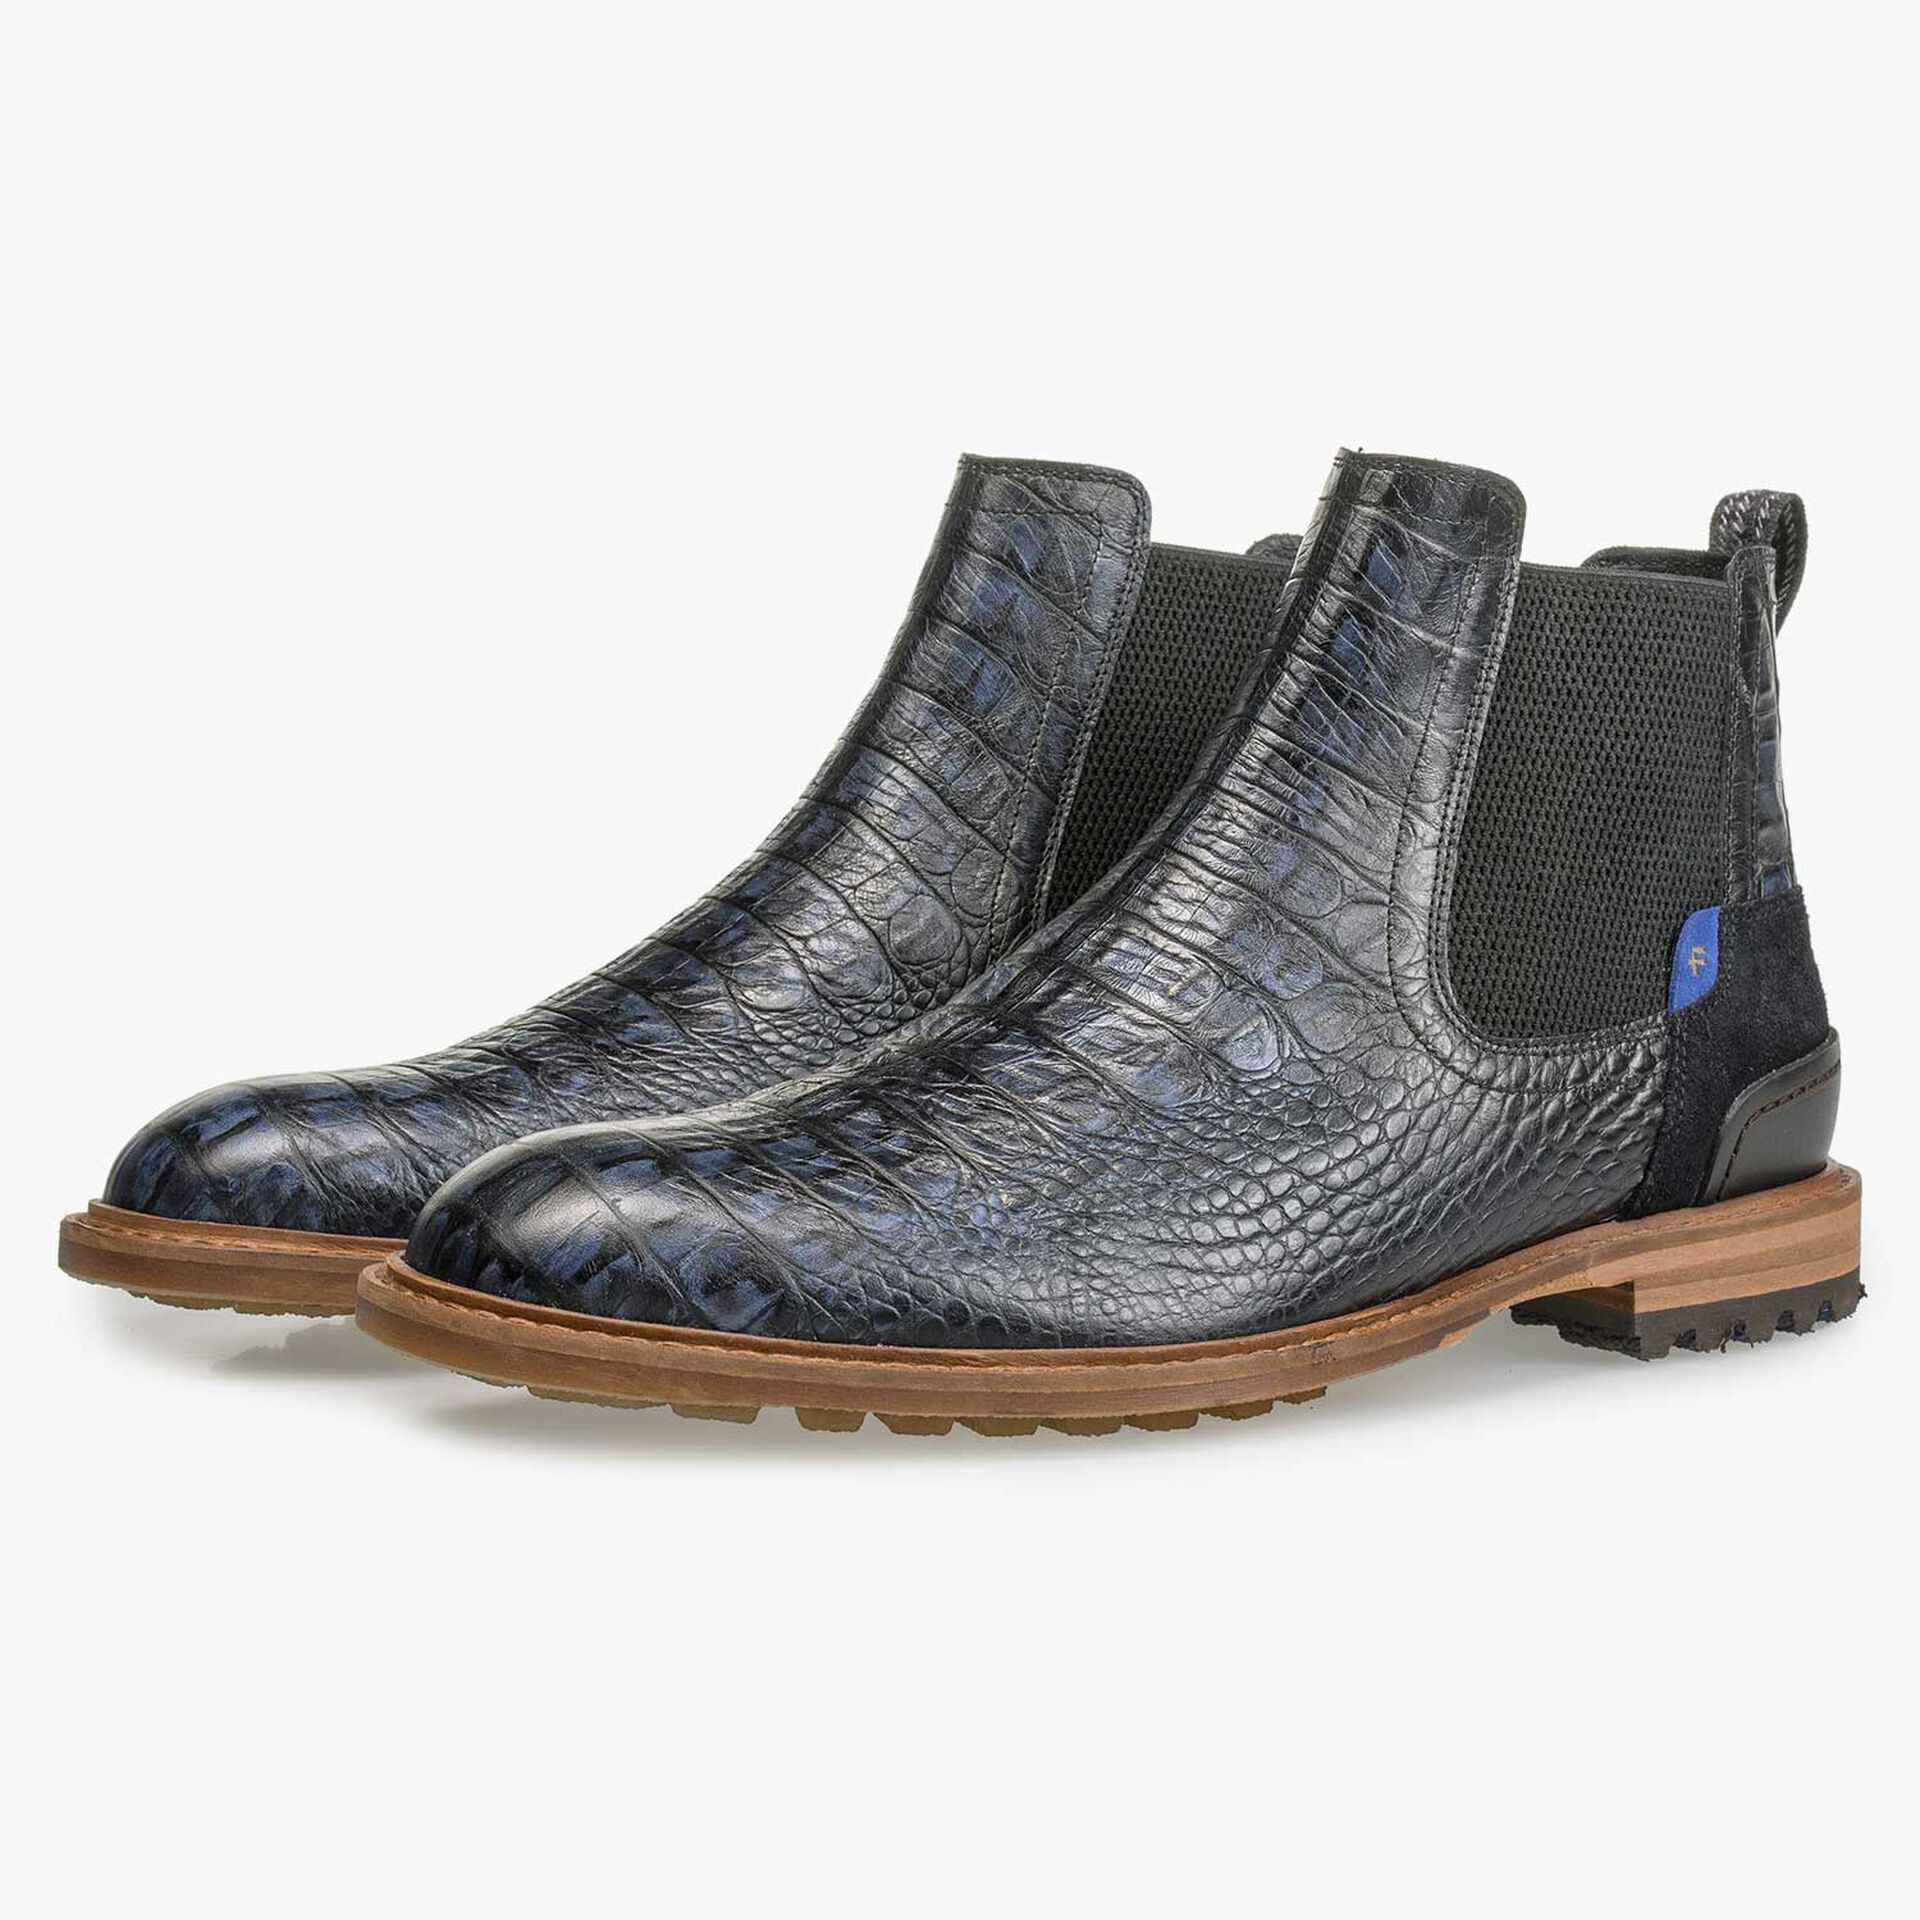 Blauer Leder Chelsea Boot mit Krokoprint